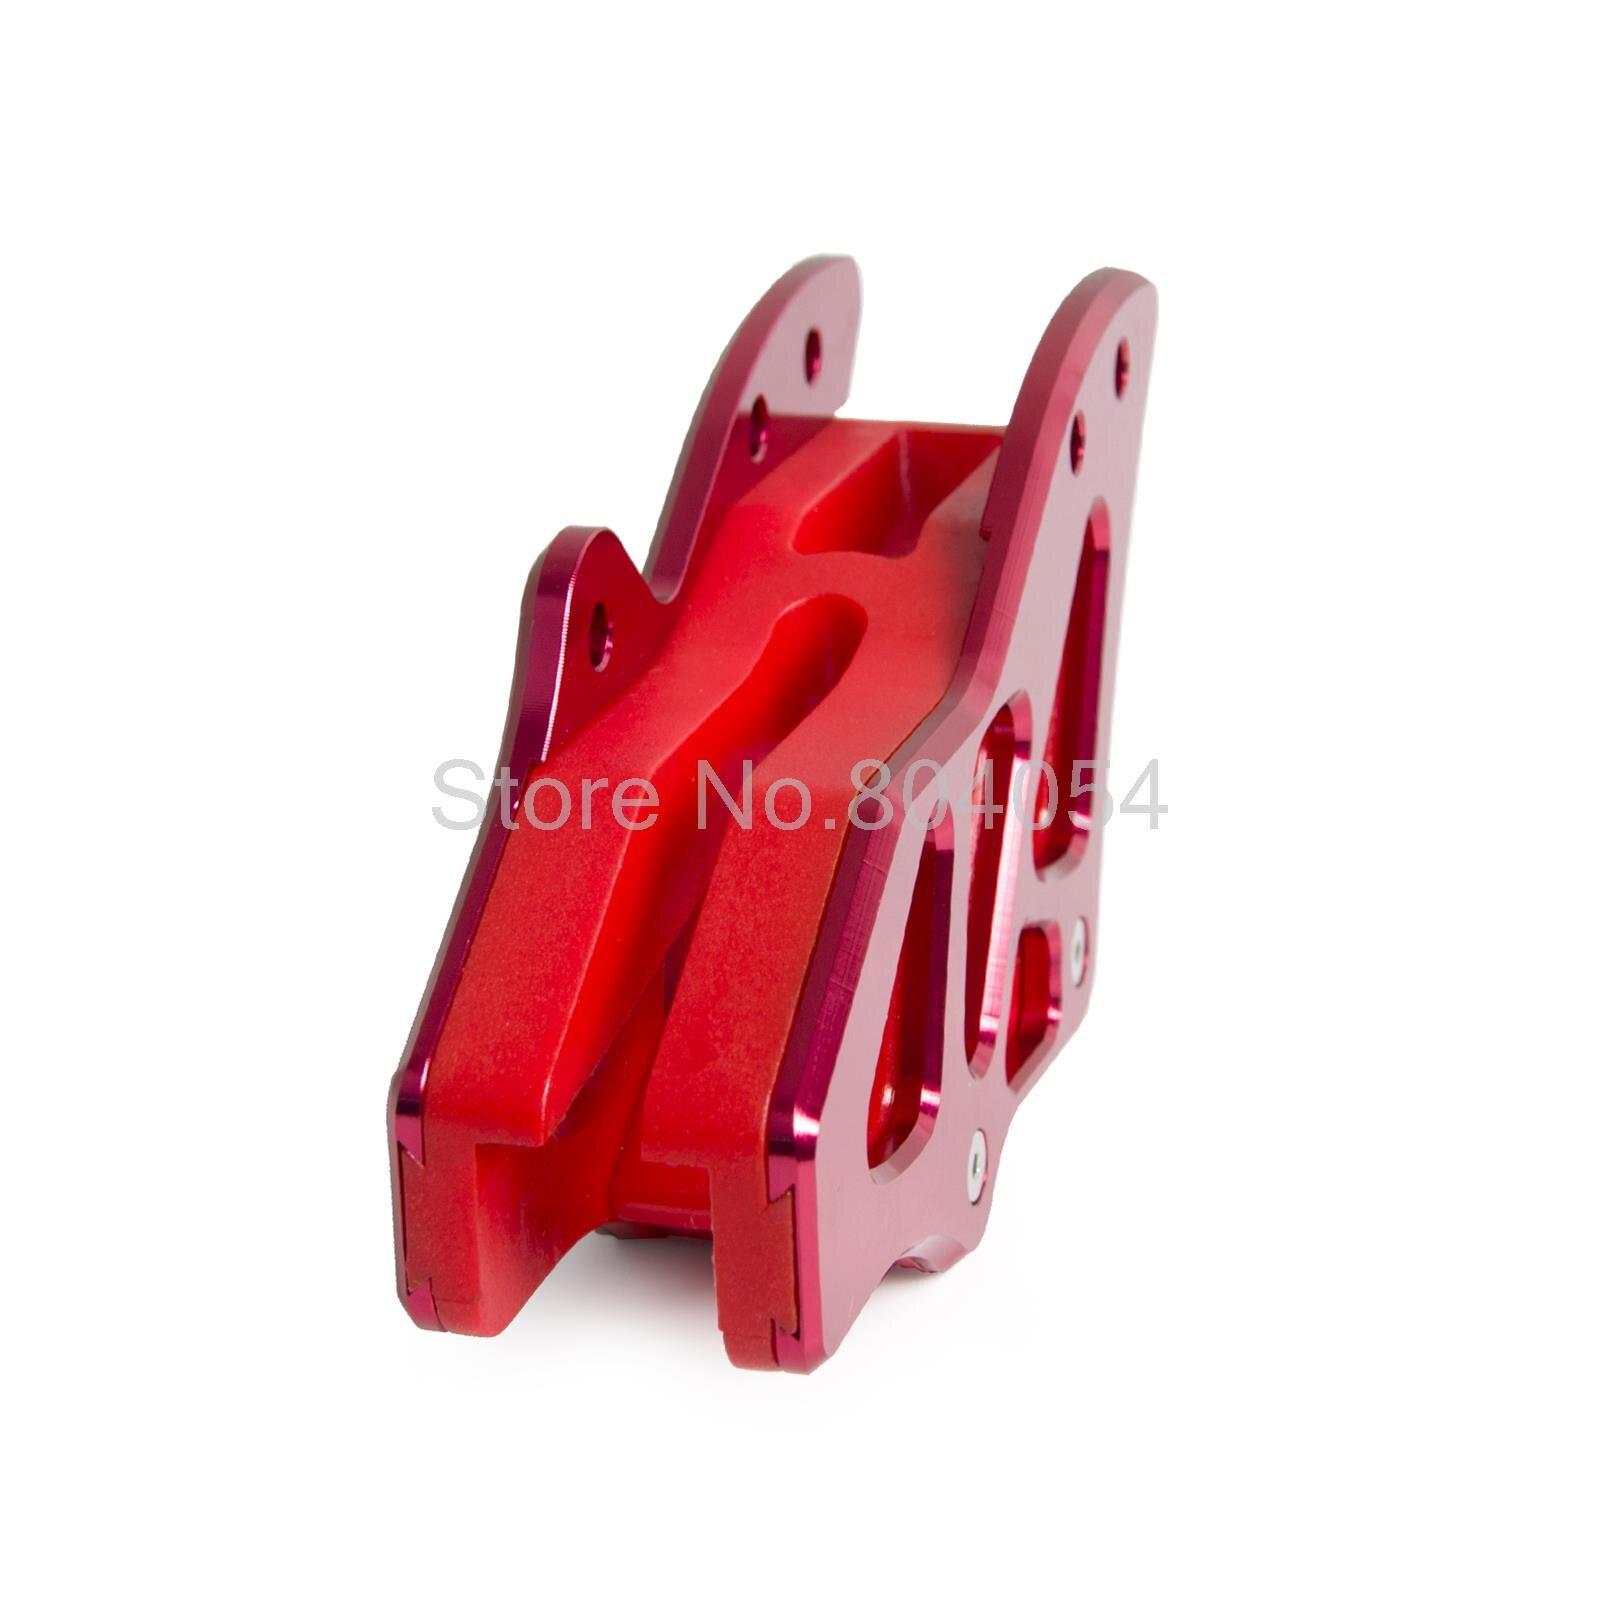 CNC Anodized Chain Guide Fits Honda CRF250R CRF250X CRF450R CRF450X 2008 2016 2010 2012 2014 2015